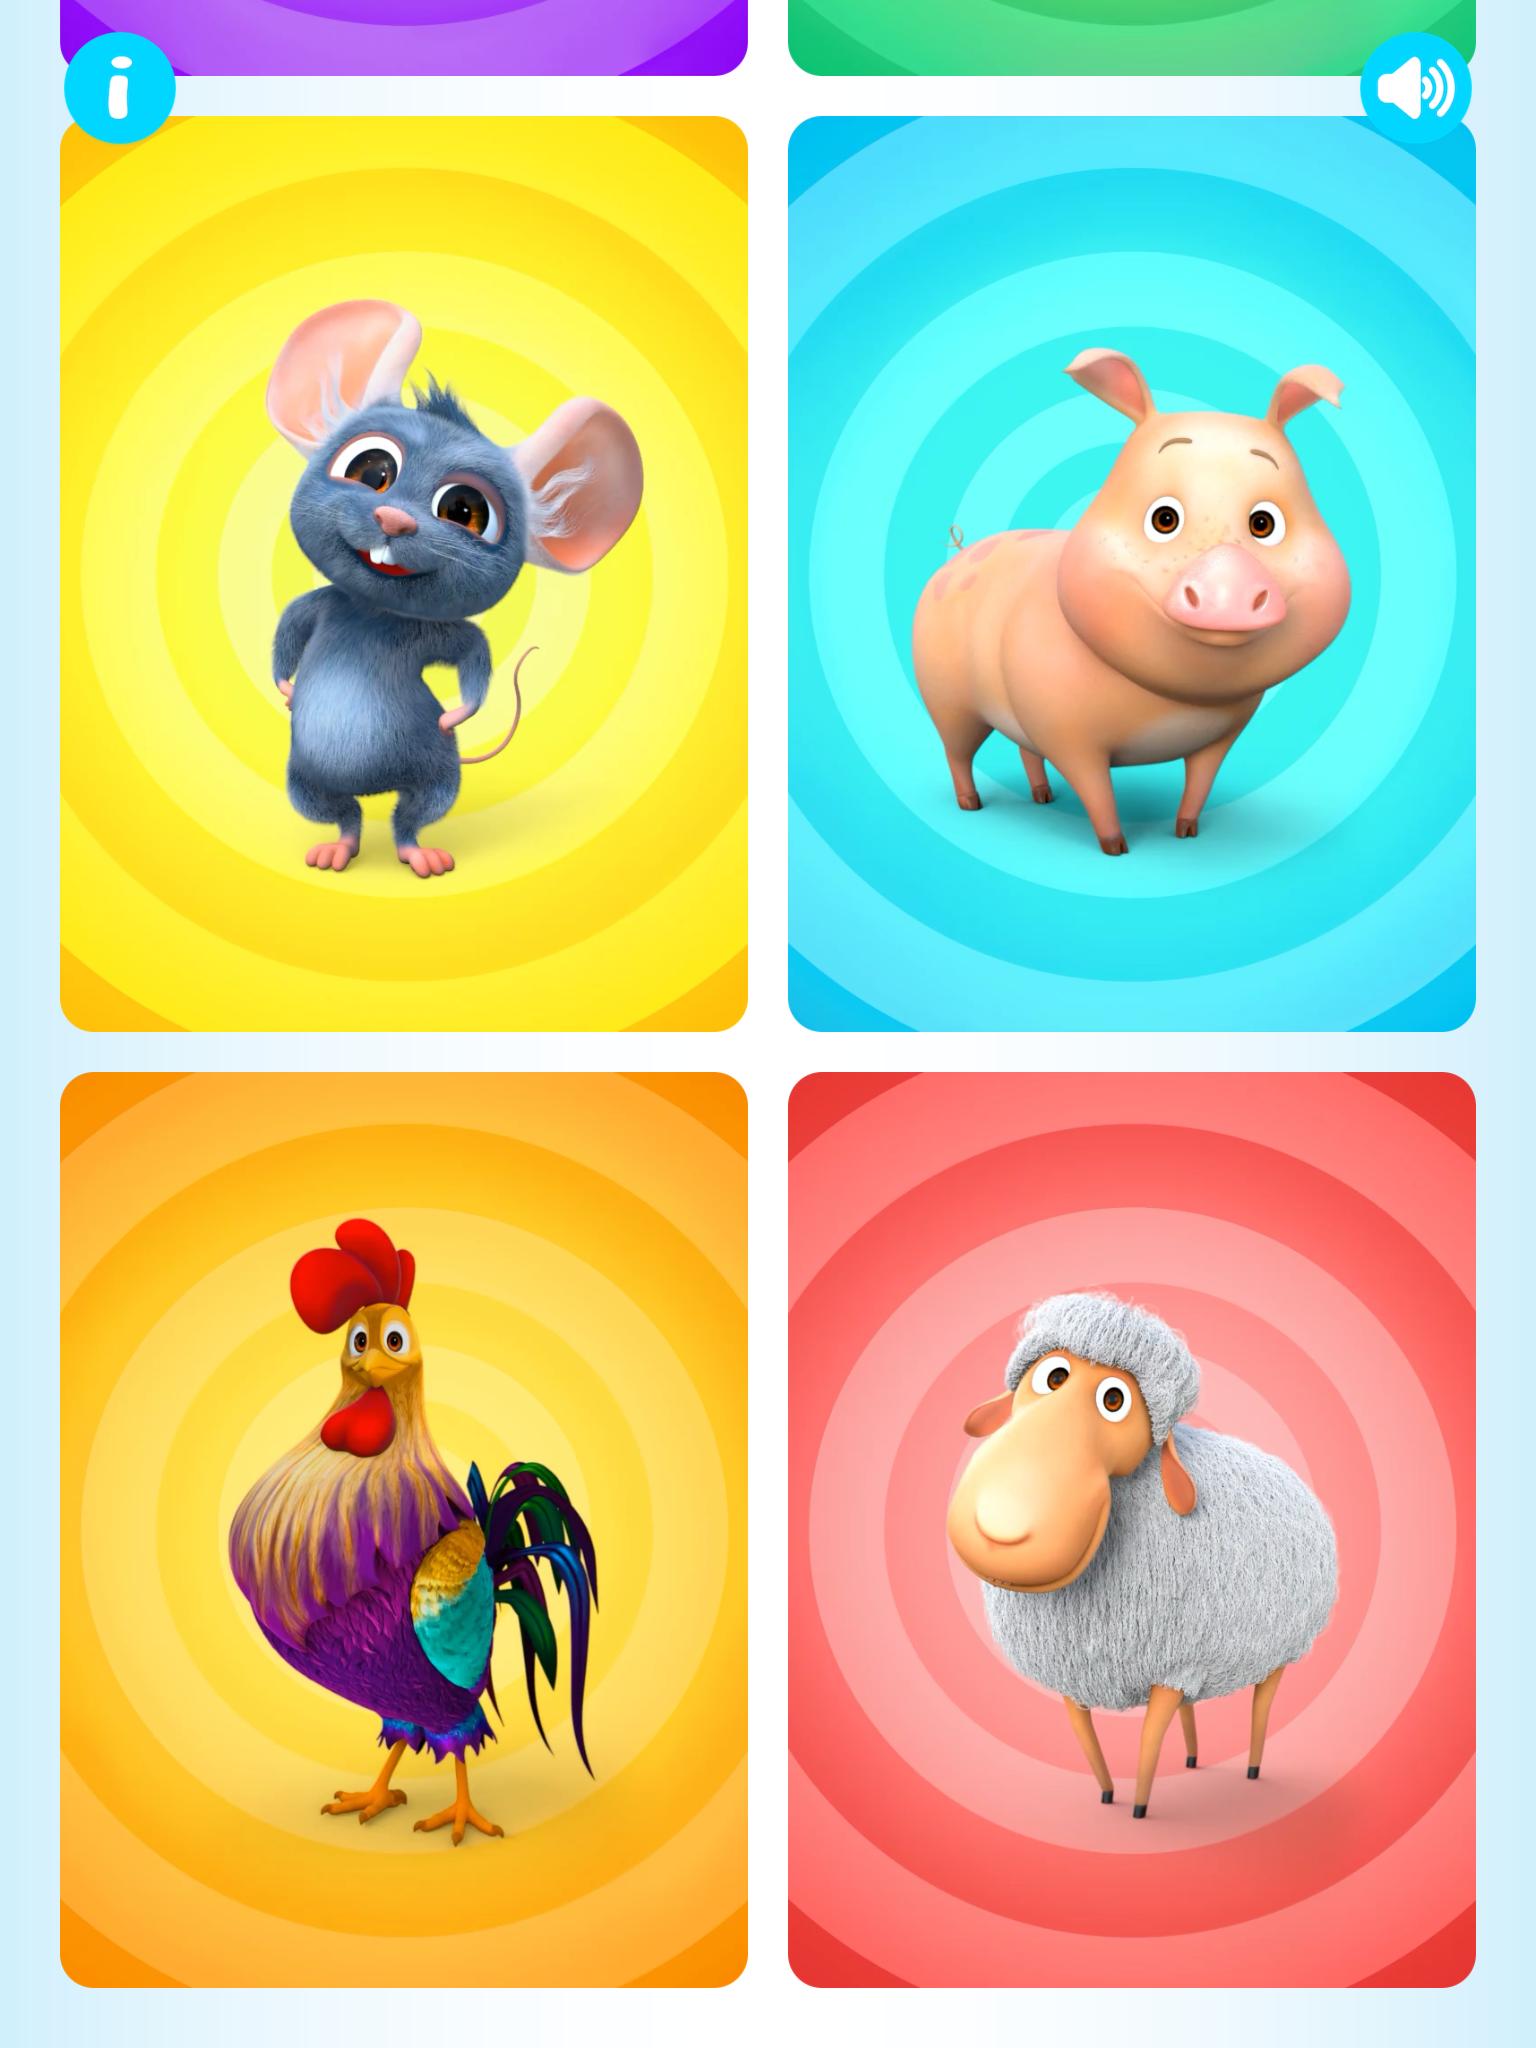 NEW! THE FARM ANIMALS PUZZLE APP! Learn our farm animals